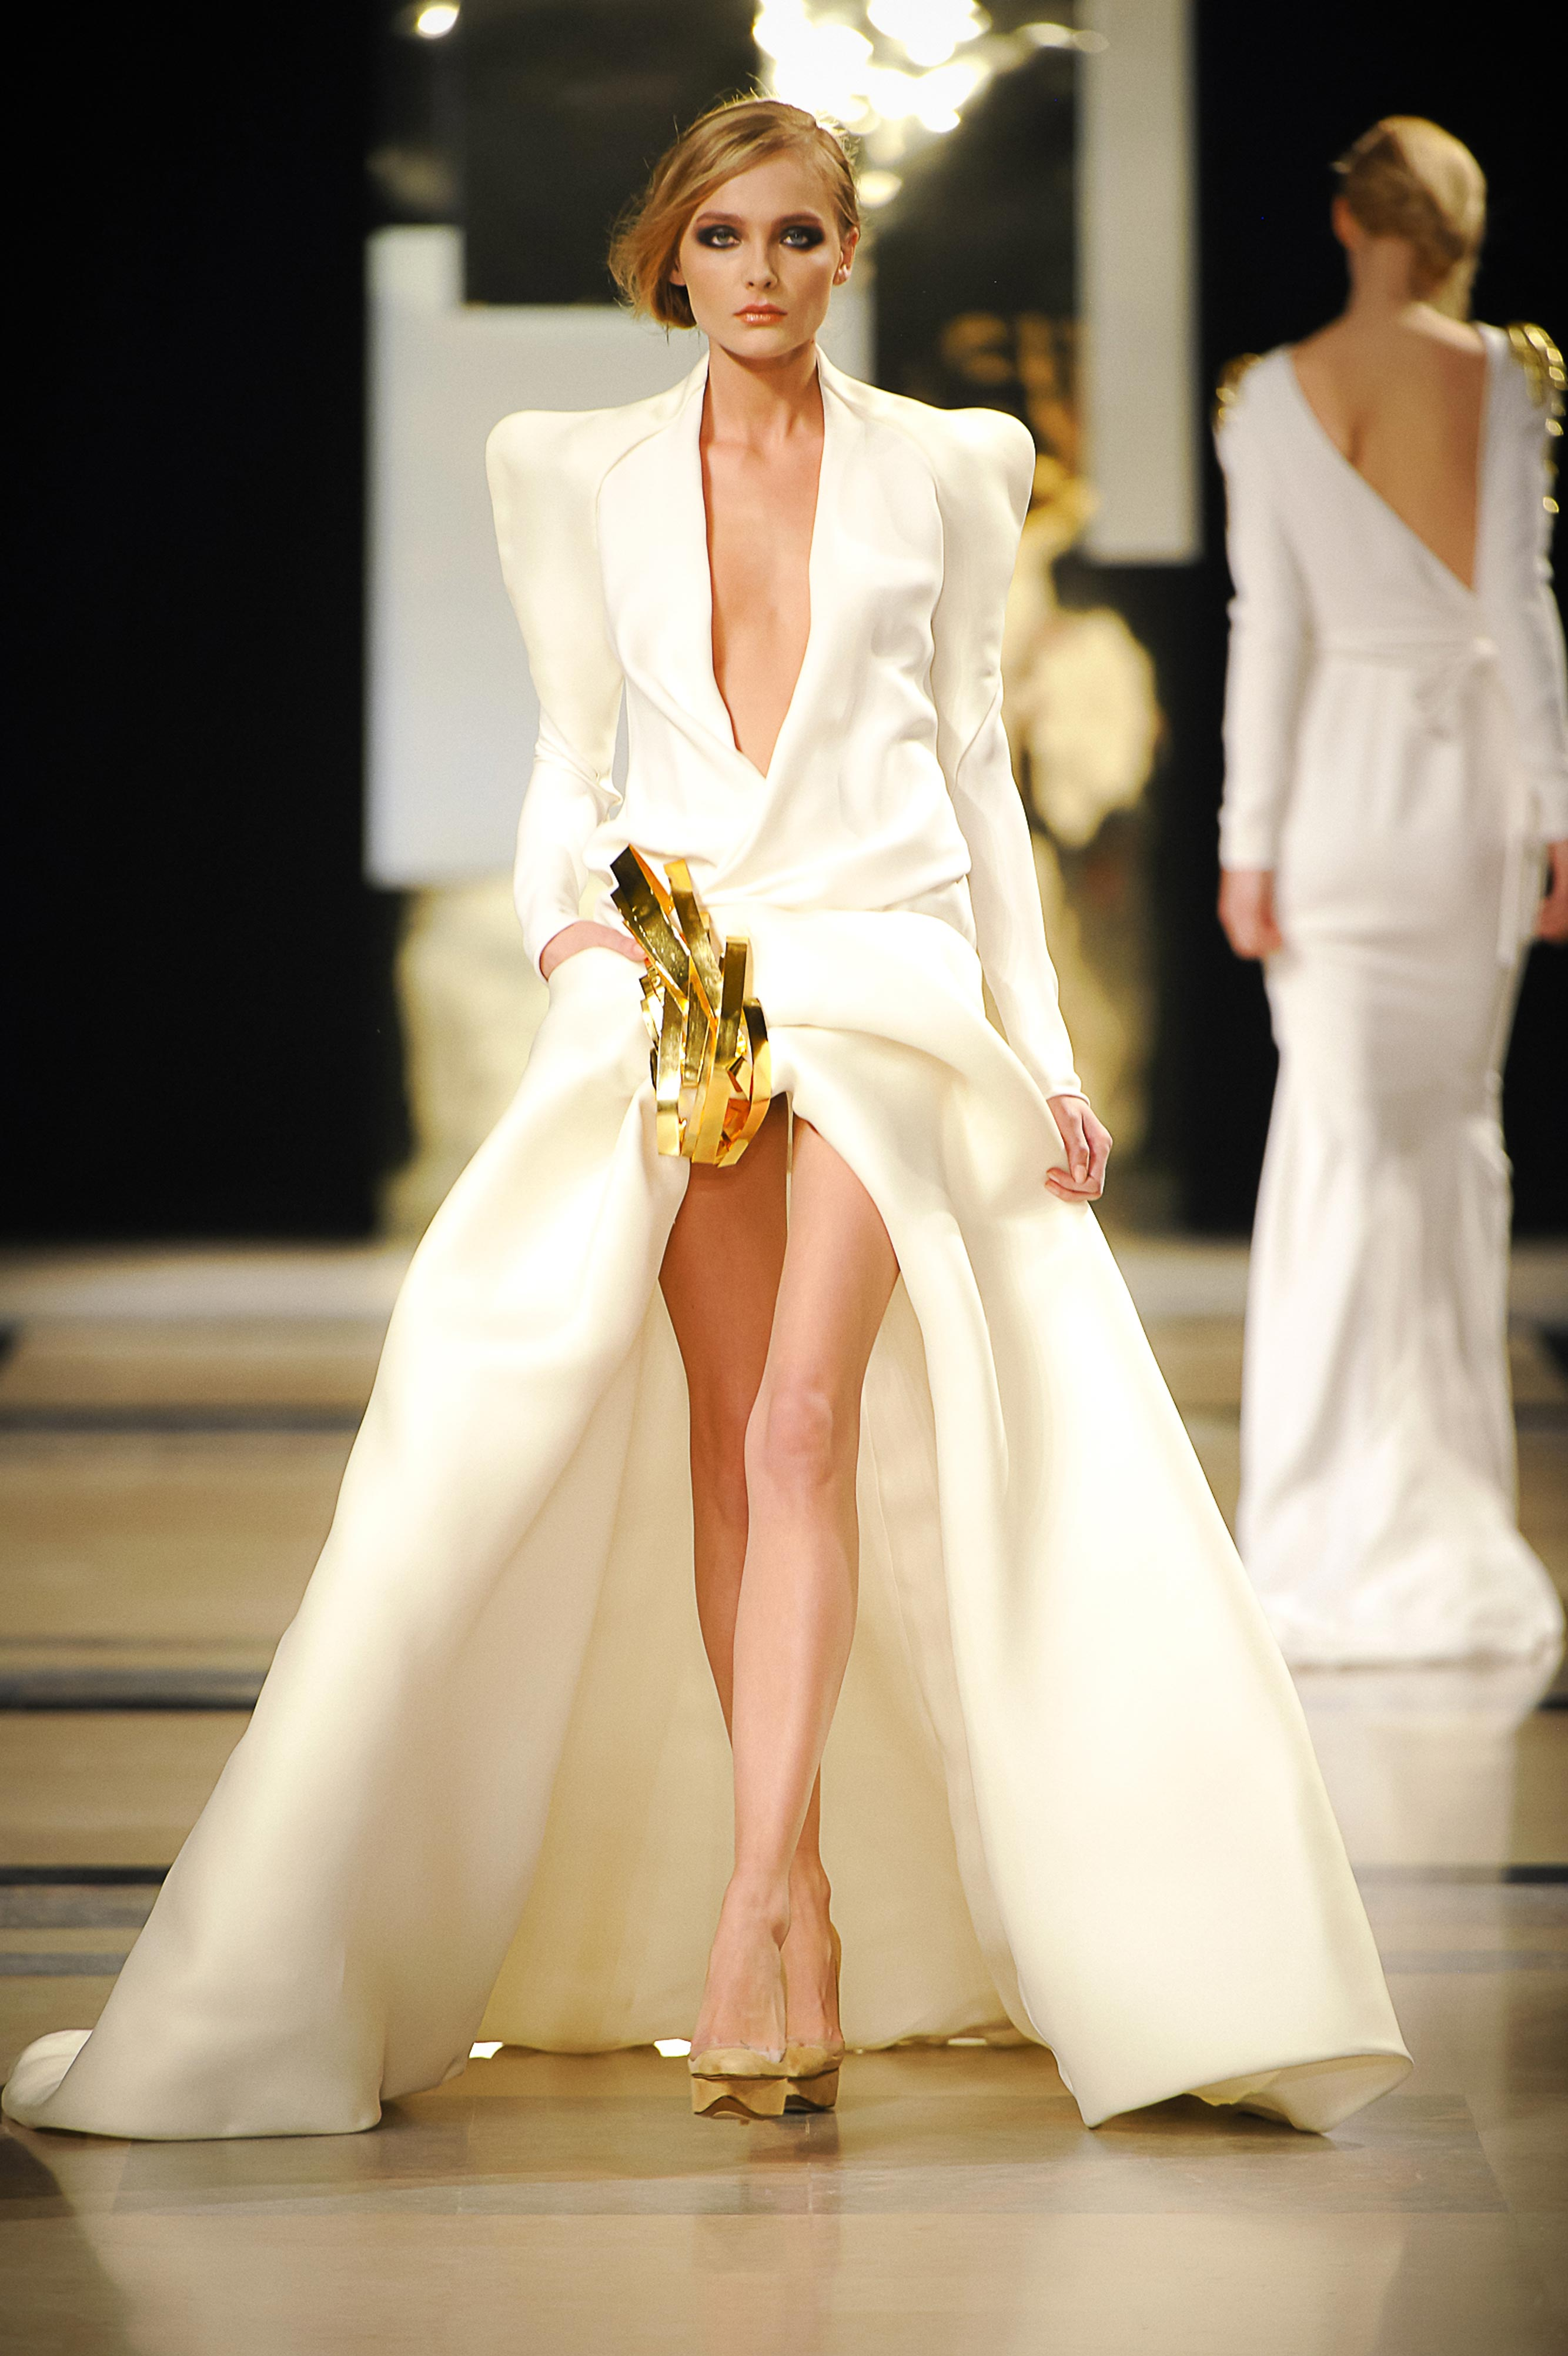 stephane rolland haute couture s/s 2012 | the fashionbrides